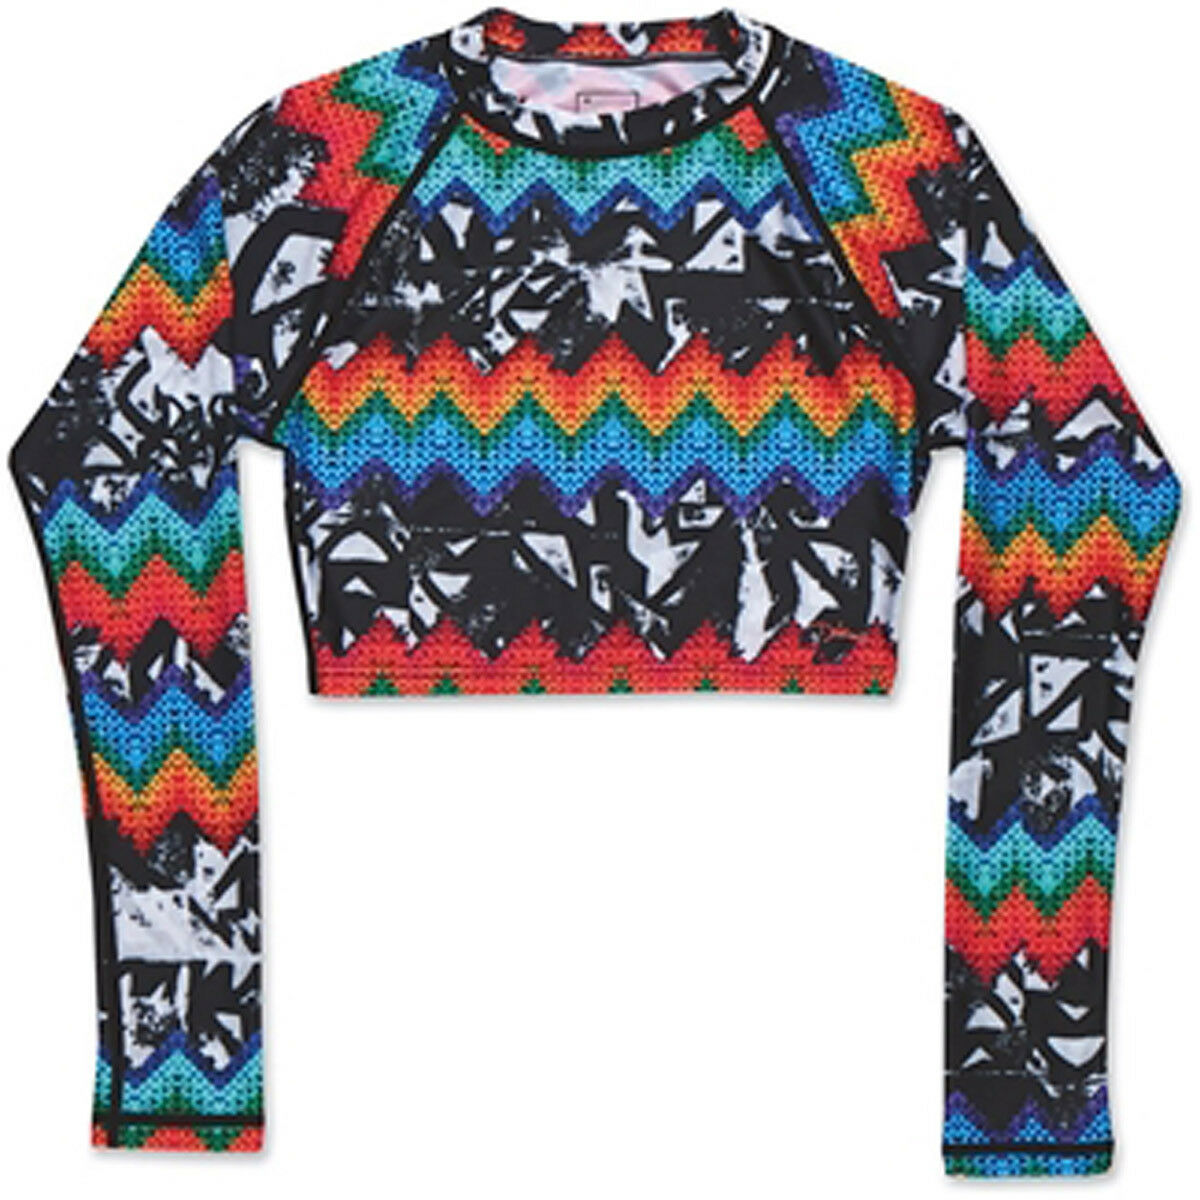 New  2015 Dakine Womens Lana L  S Crop Rashguard Shirt Medium Ziggy  wholesale store